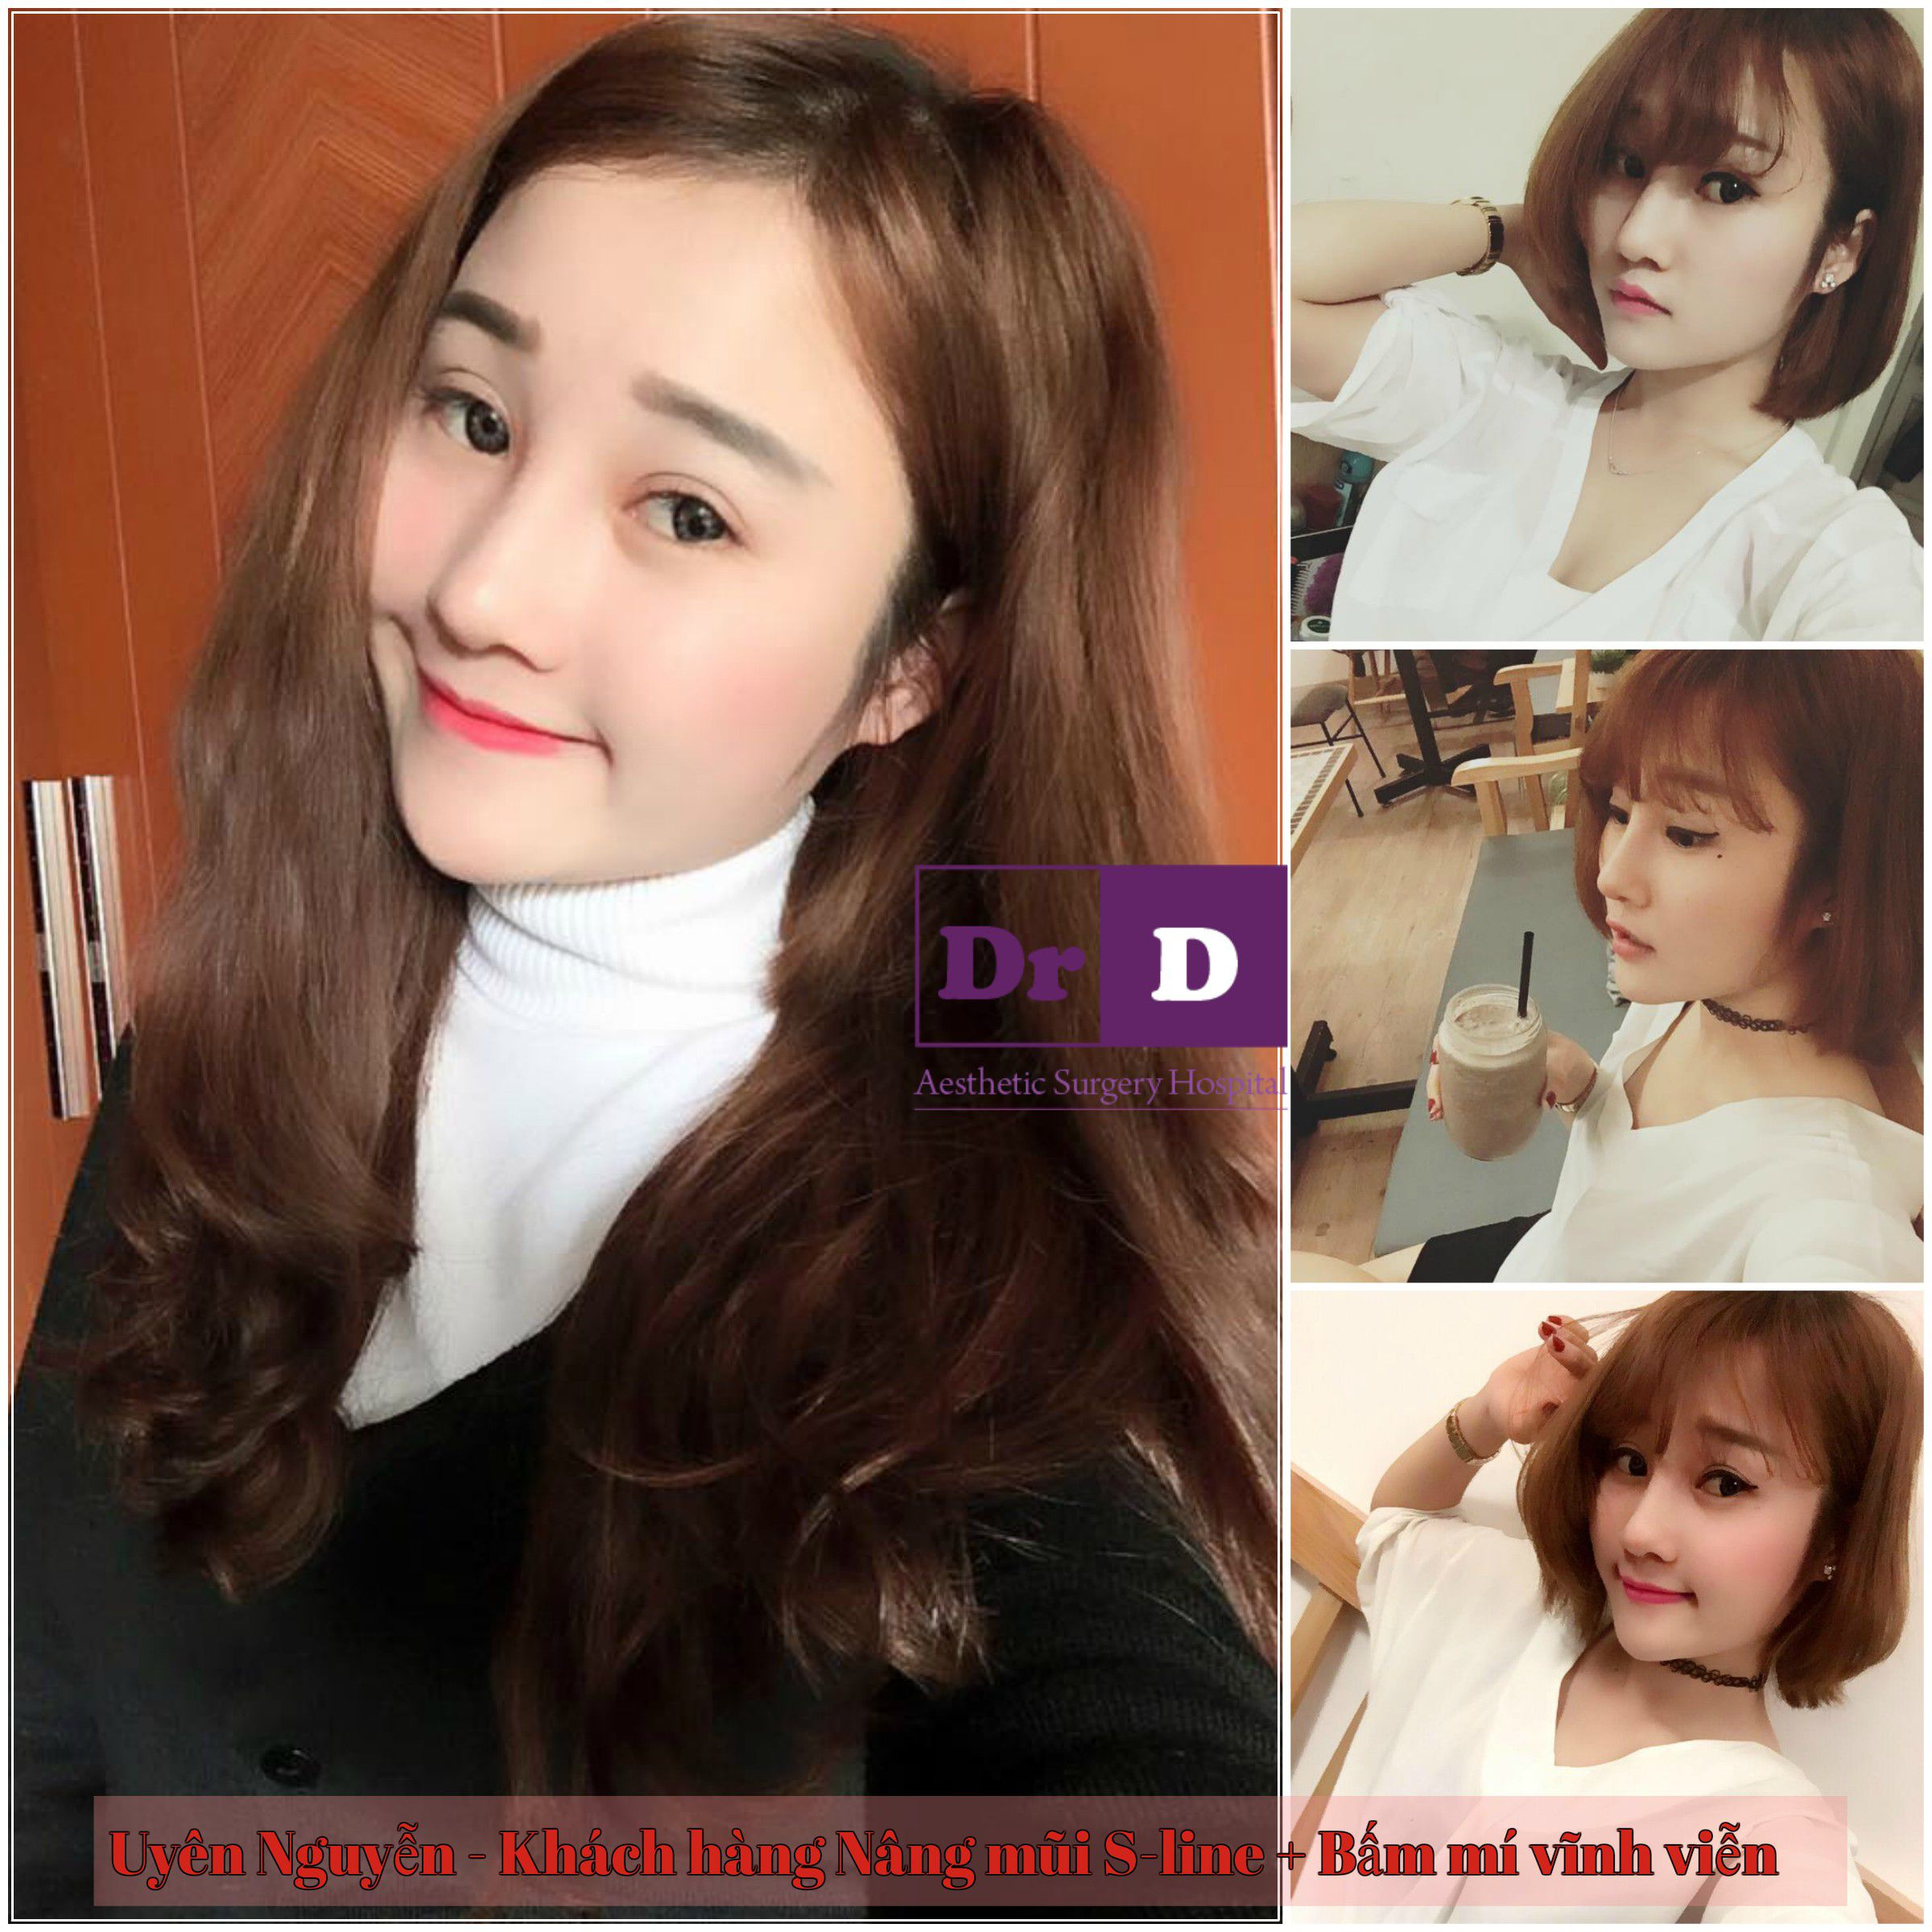 muon-selfie-dep-thi-mat-phai-dep (4)